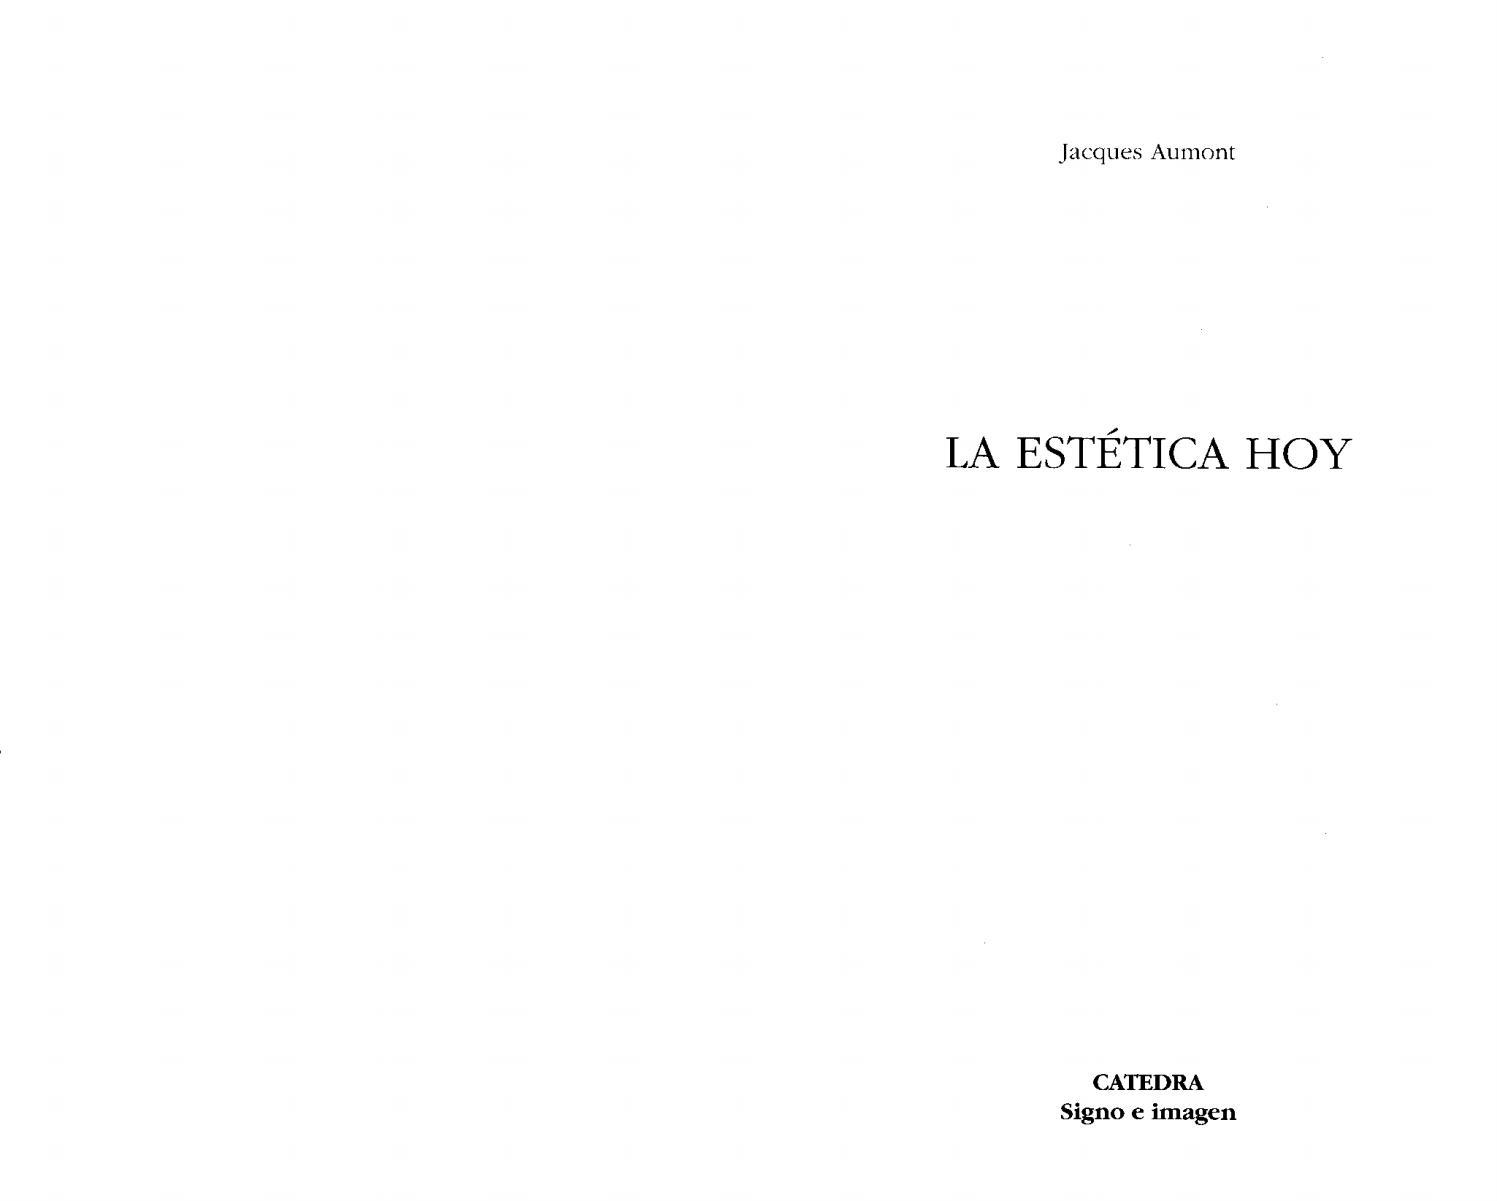 Jacques aumont la estetica hoy by Master LAV - issuu e2746225bc0e